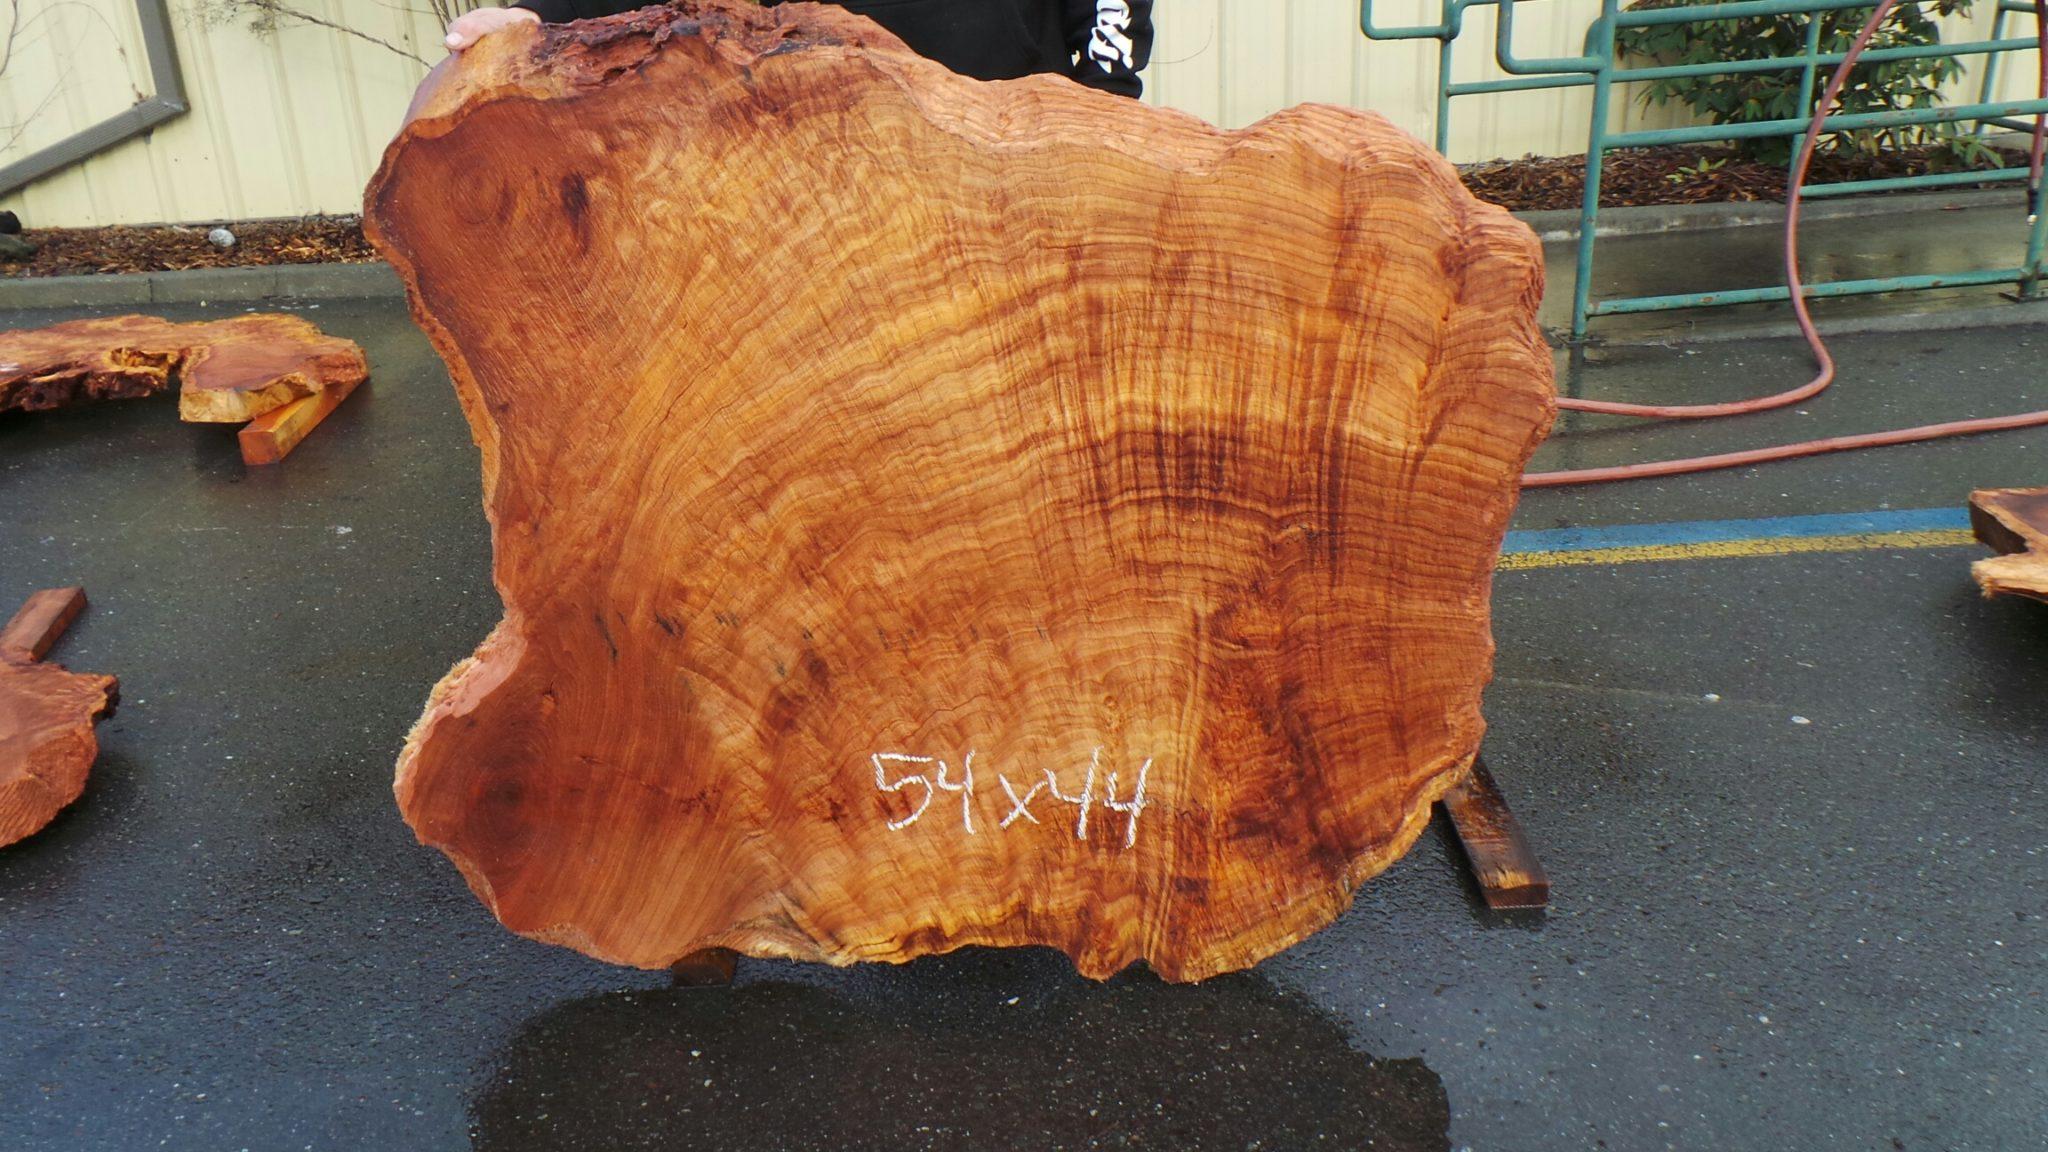 Wavy grain redwood slab